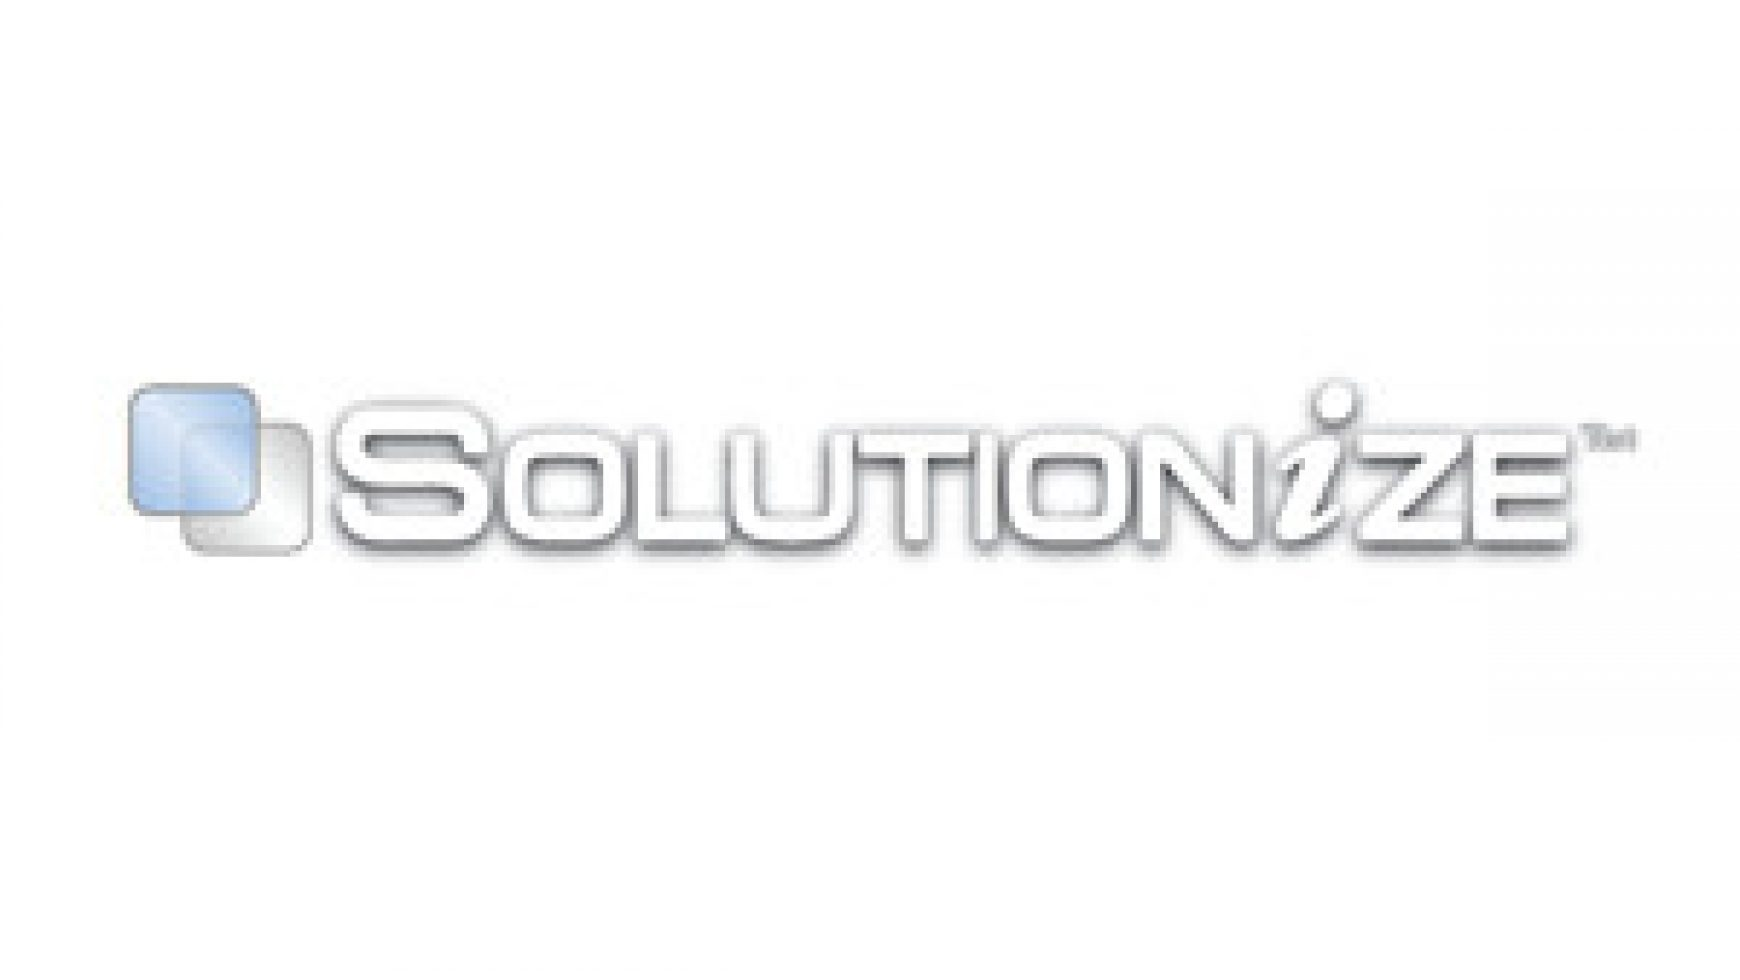 Solutionize